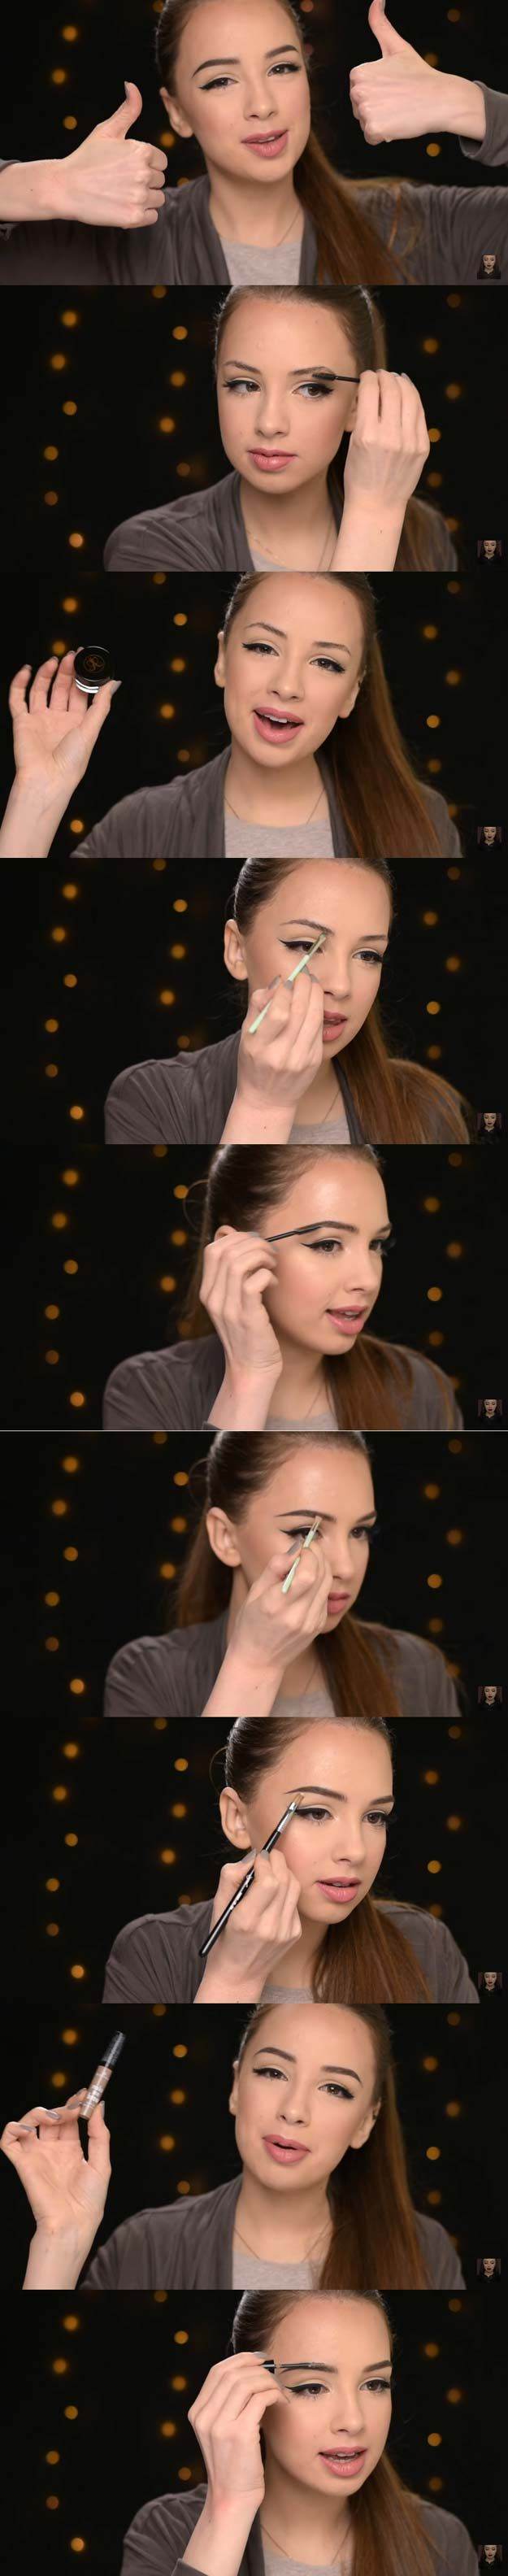 31 MUST SEE Eyebrow Tutorials - The Goddess